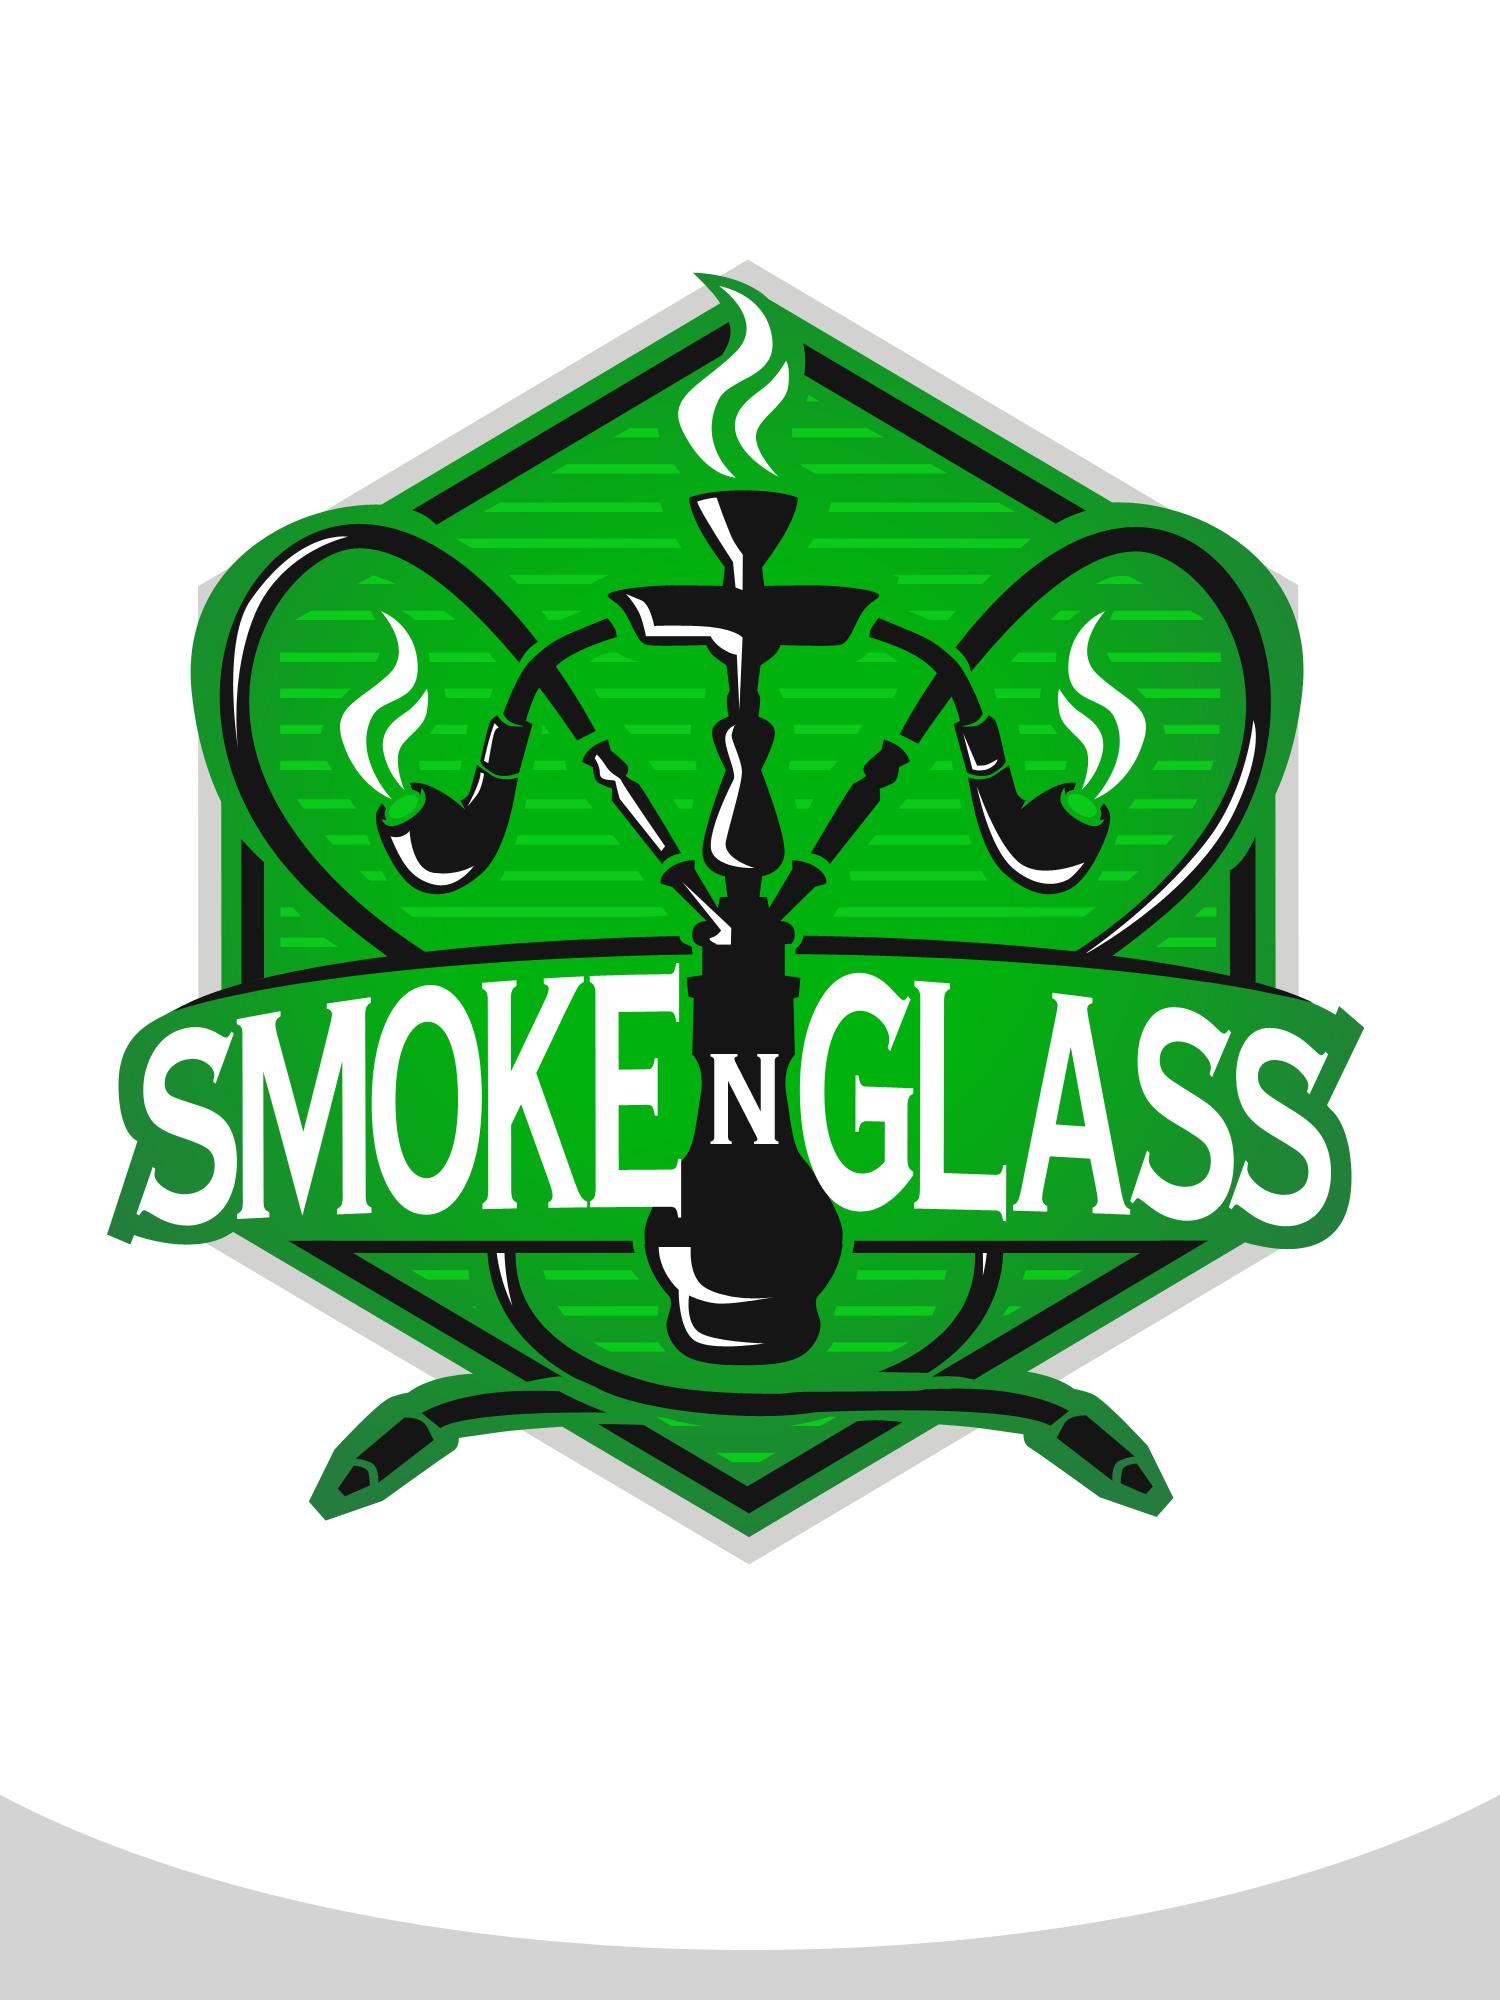 Logo design for smoke shop needed